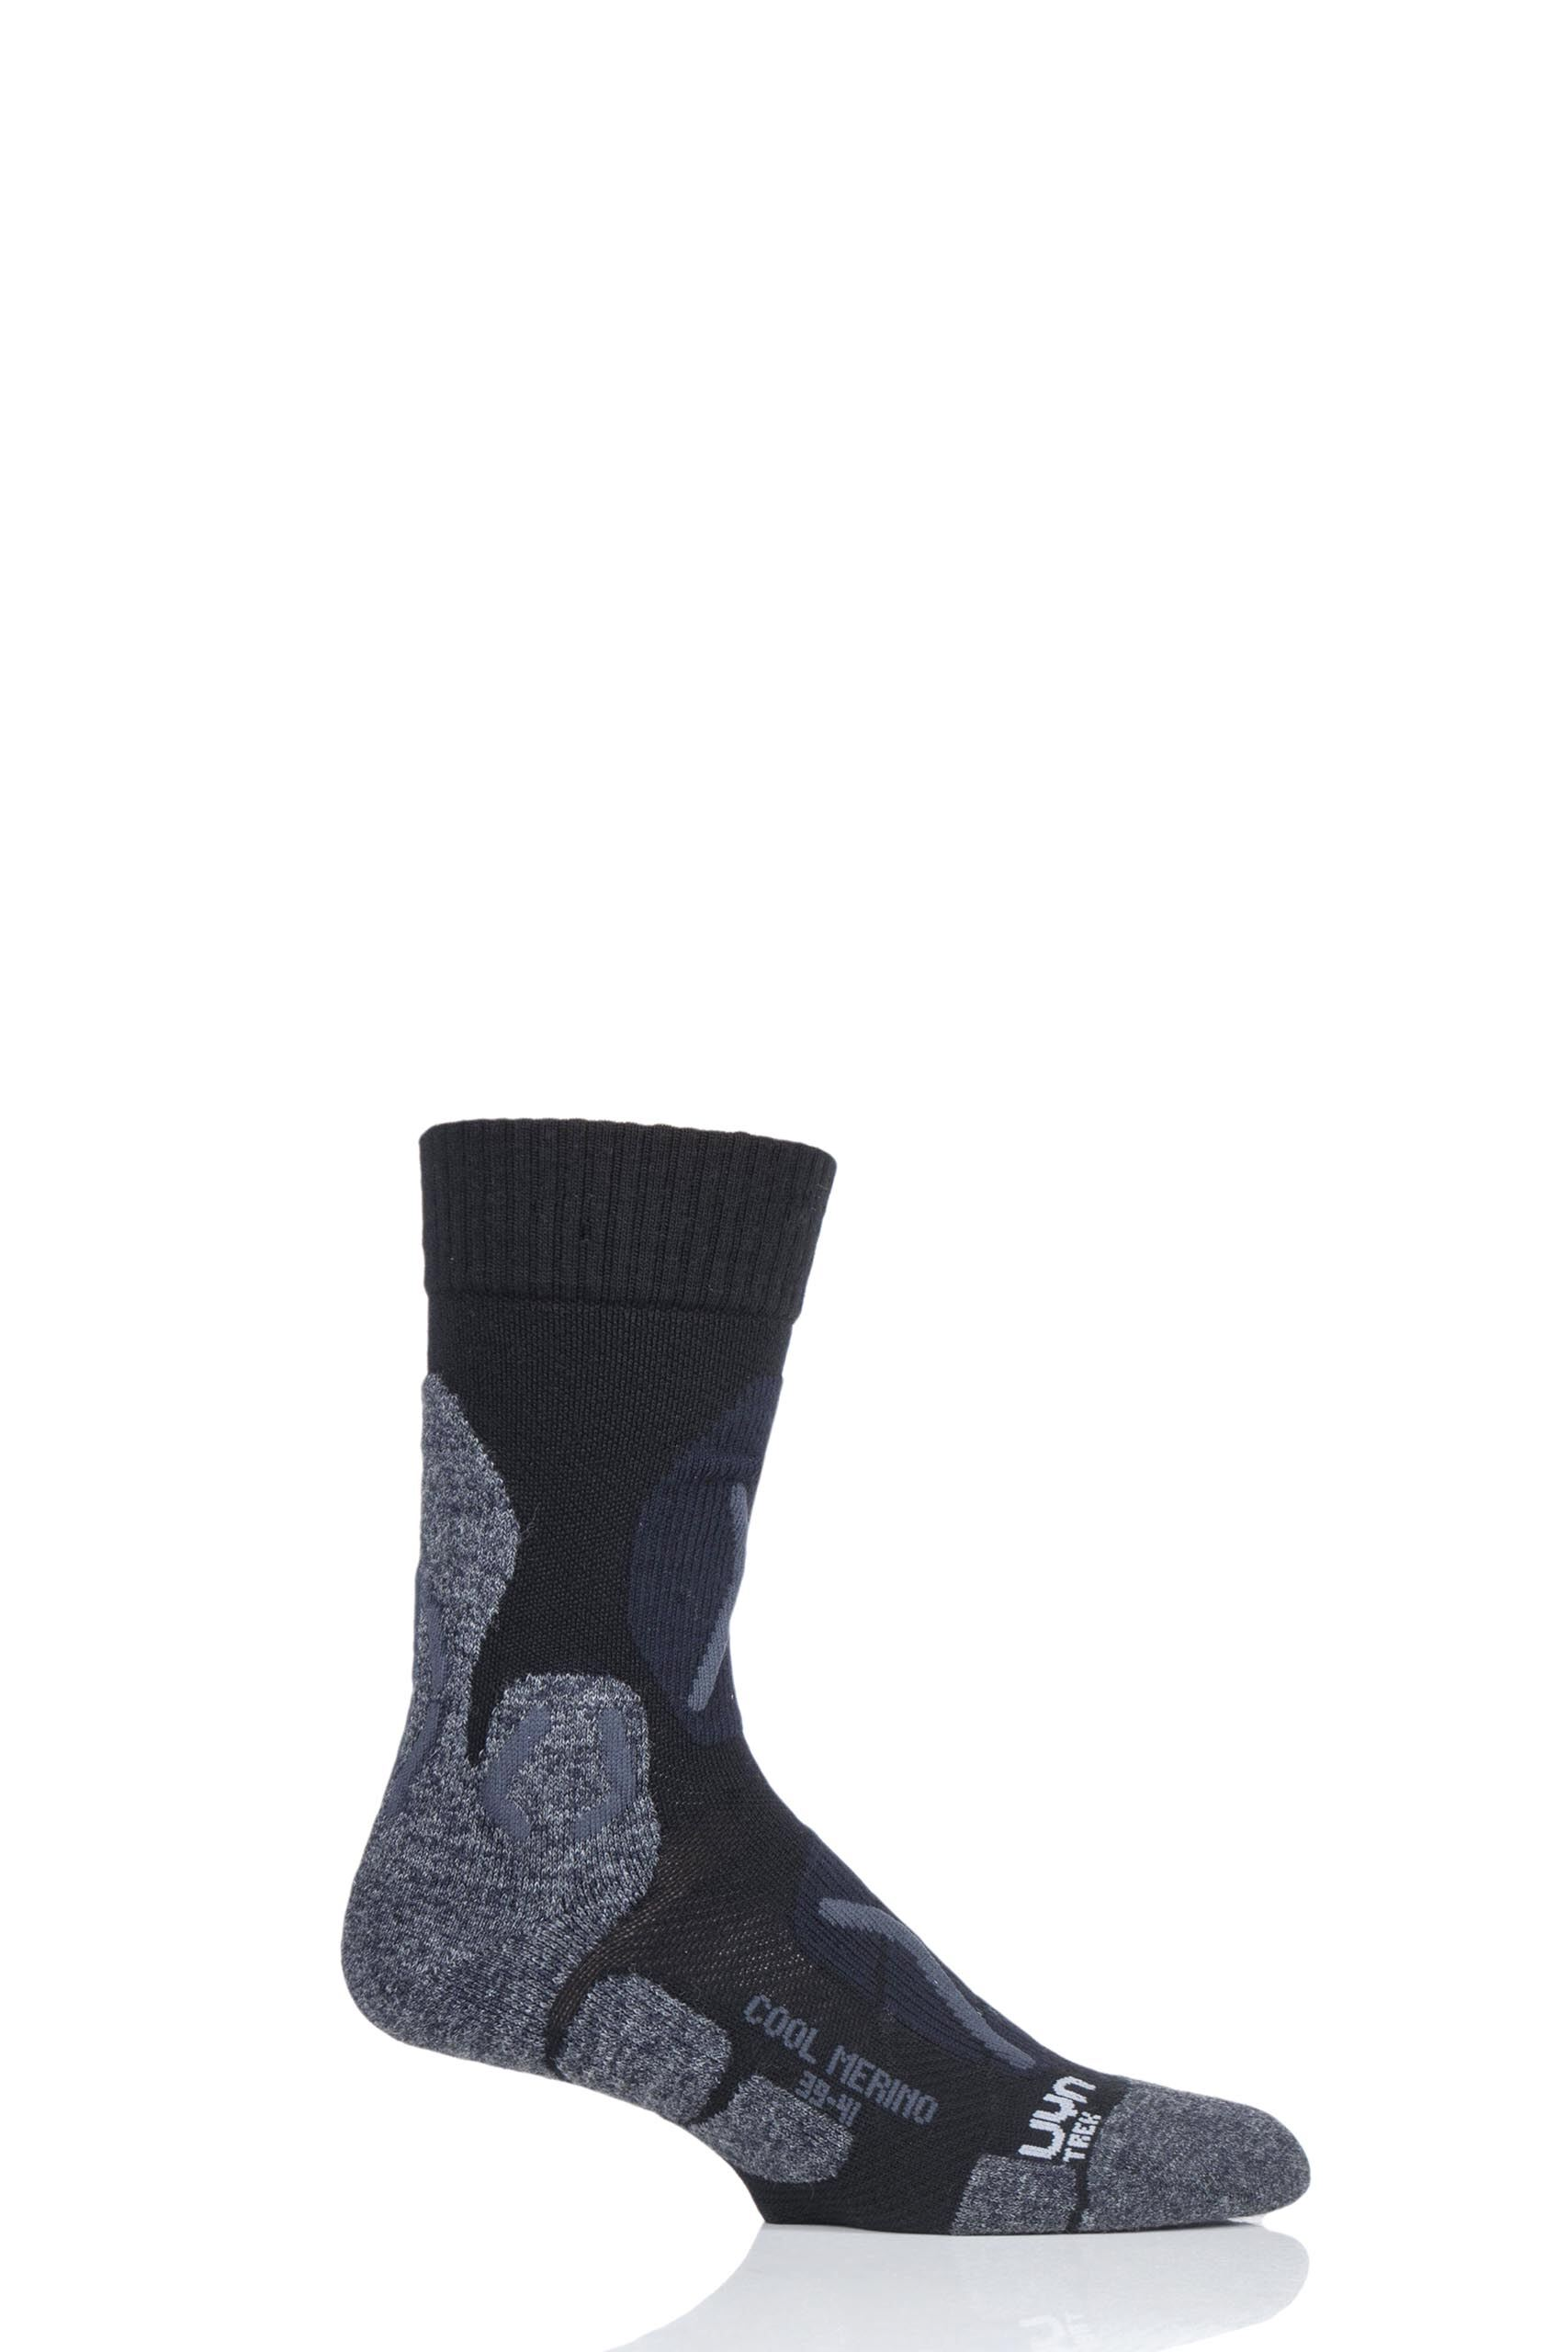 Image of 1 Pair Black Cool Merino Trekking Socks Men's 8-9.5 Mens - UYN